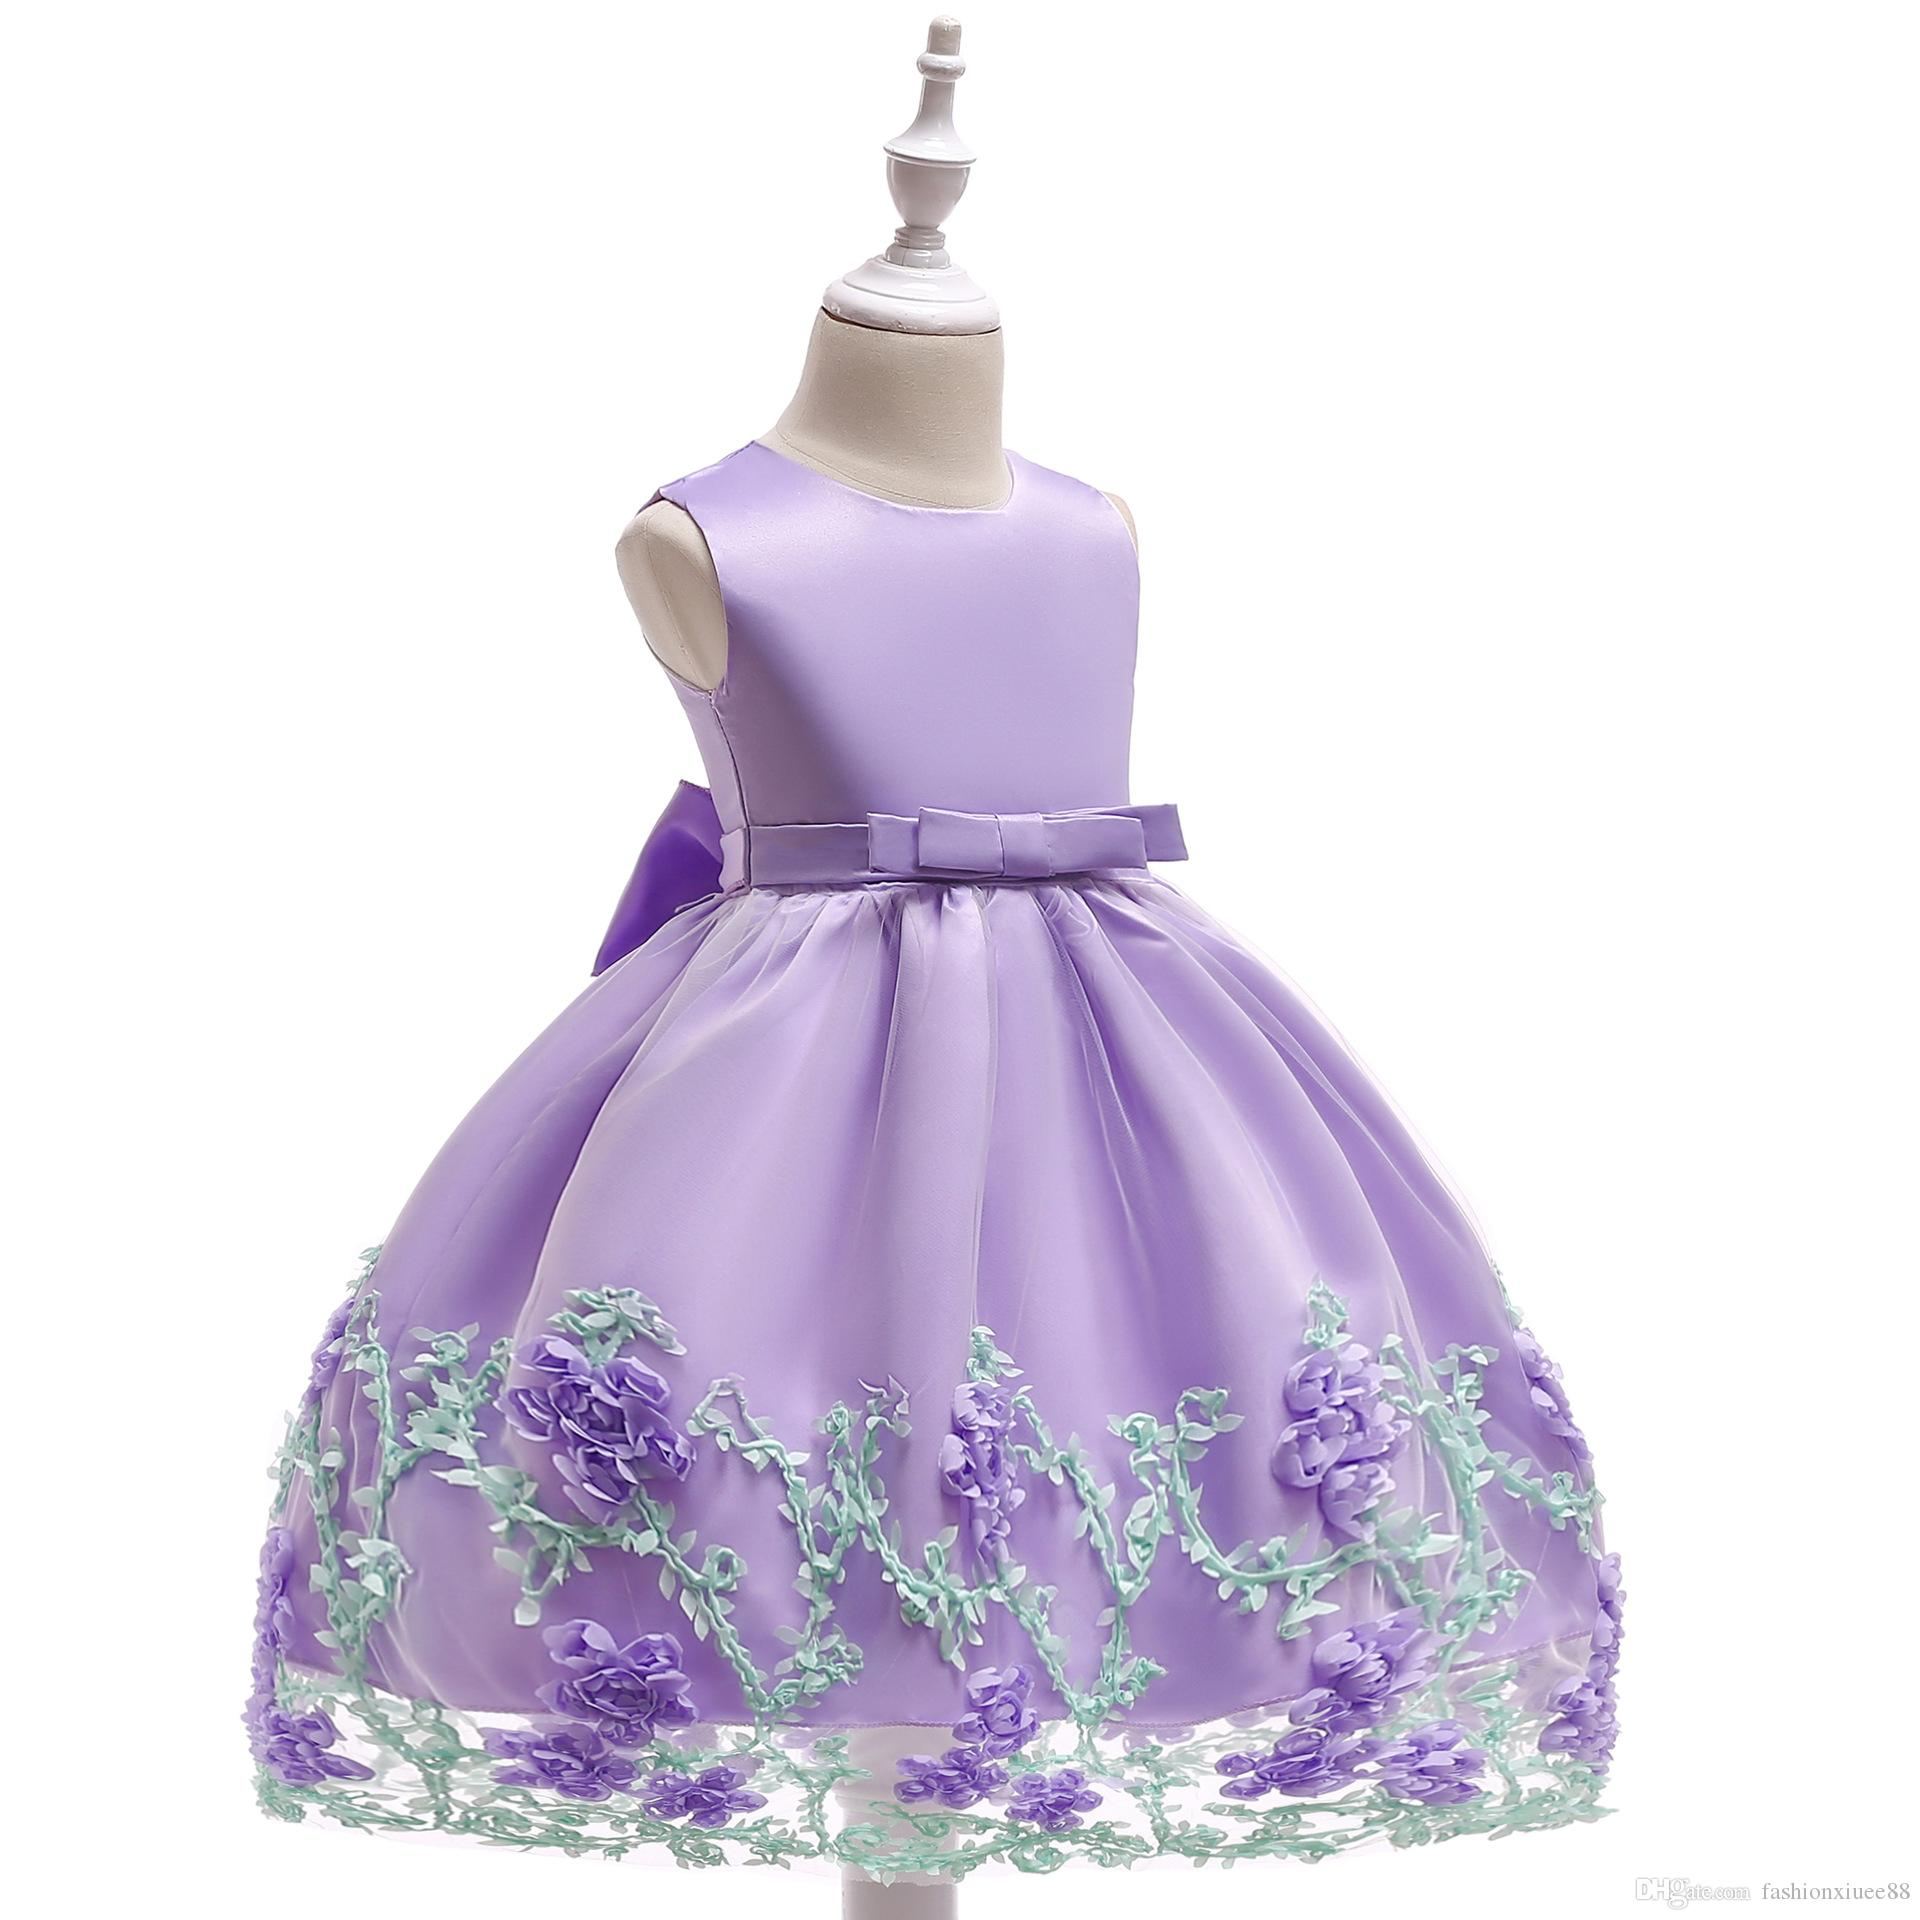 2019 Mermaid Flower Girls Dresses Scoop Cap sleeve Zipper Sequined 3D-Floral Applique Tulle Tiered Skirts Kids Gown